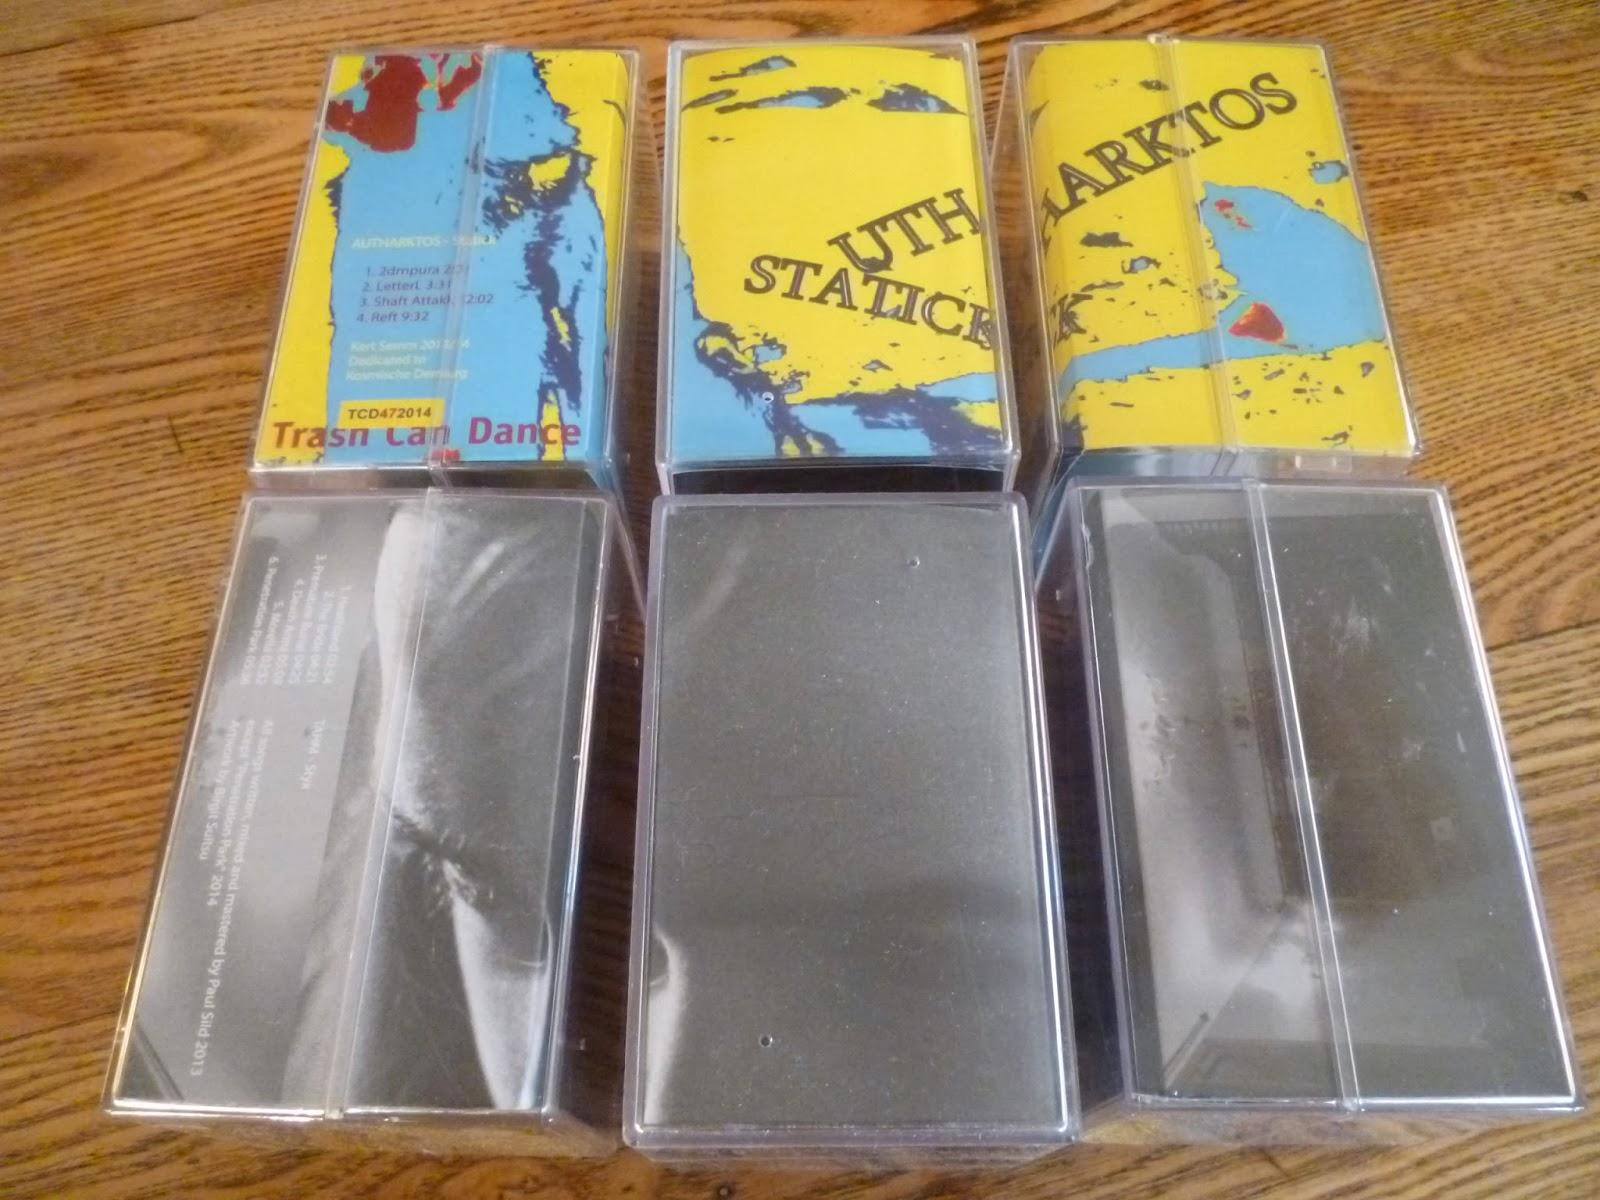 TAHM - Autharktos - Styx - Statick